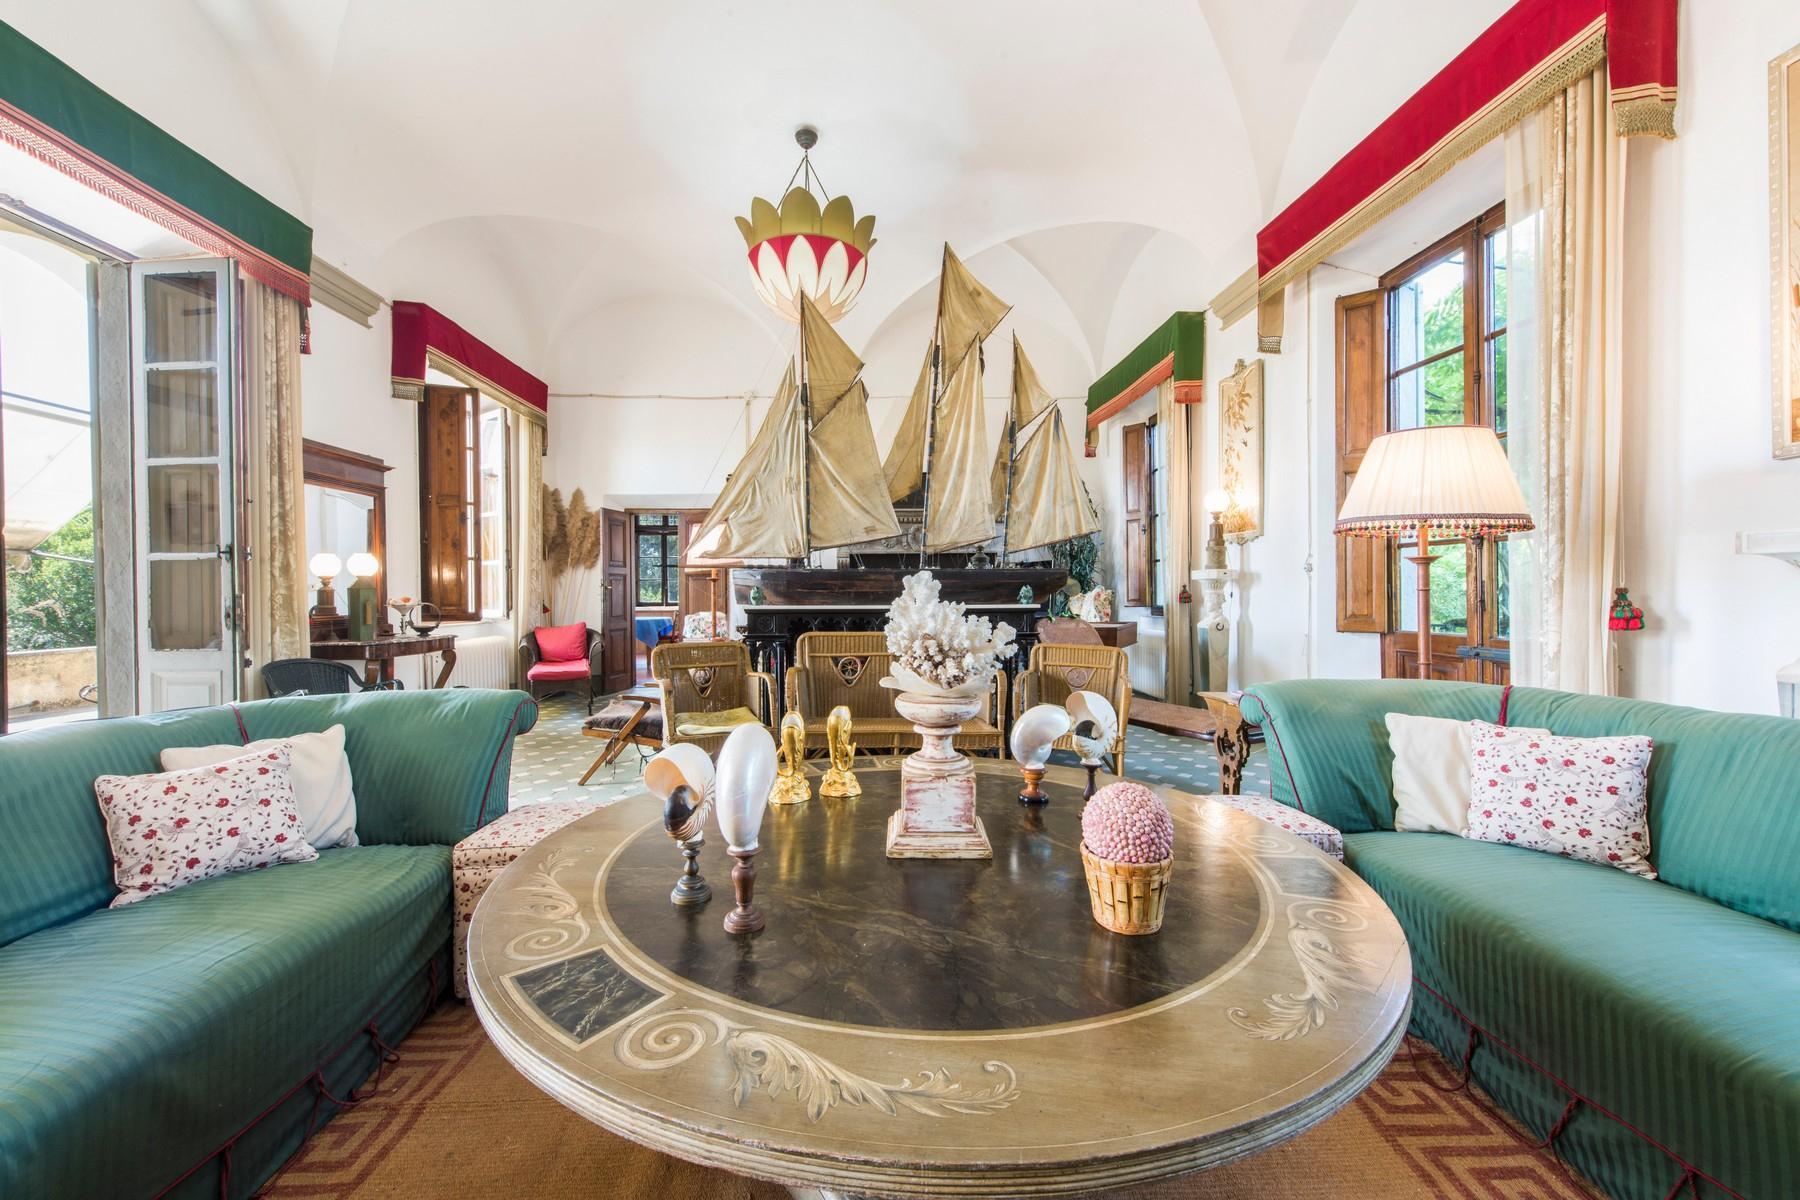 Villa historique en bord de mer à Forte dei Marmi - 12